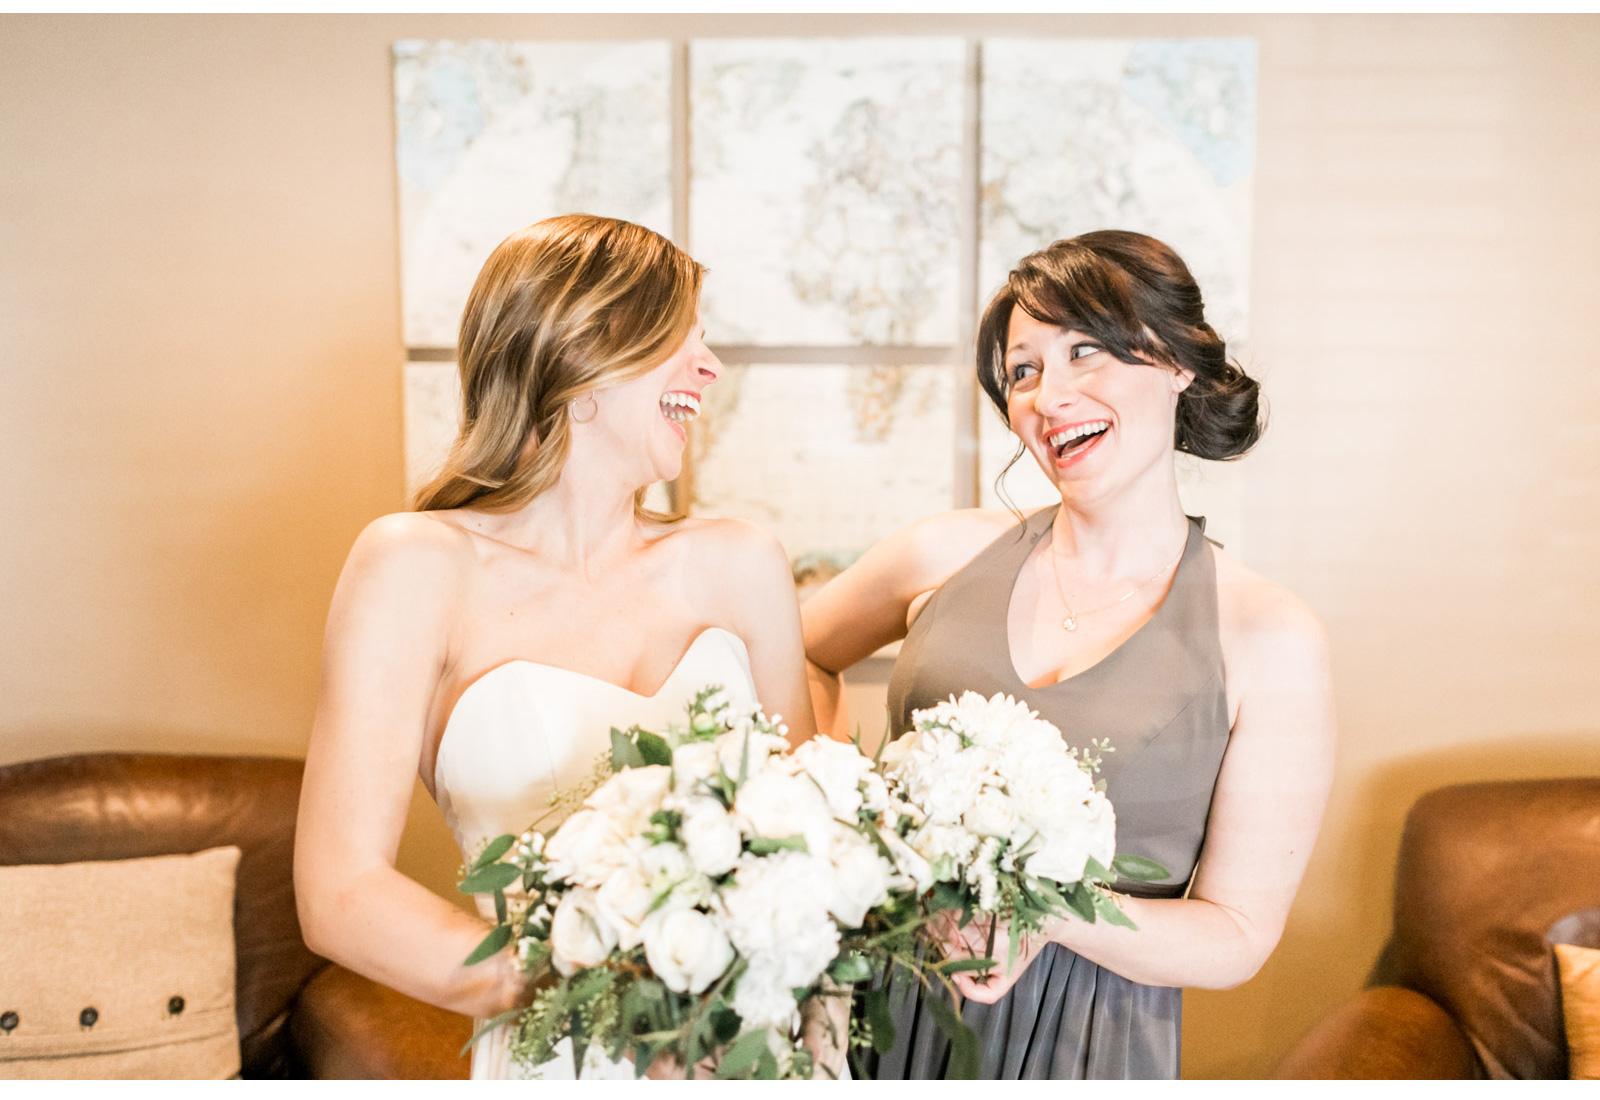 California-Wedding-Photographer-Natalie-Schutt-Photography_02.jpg